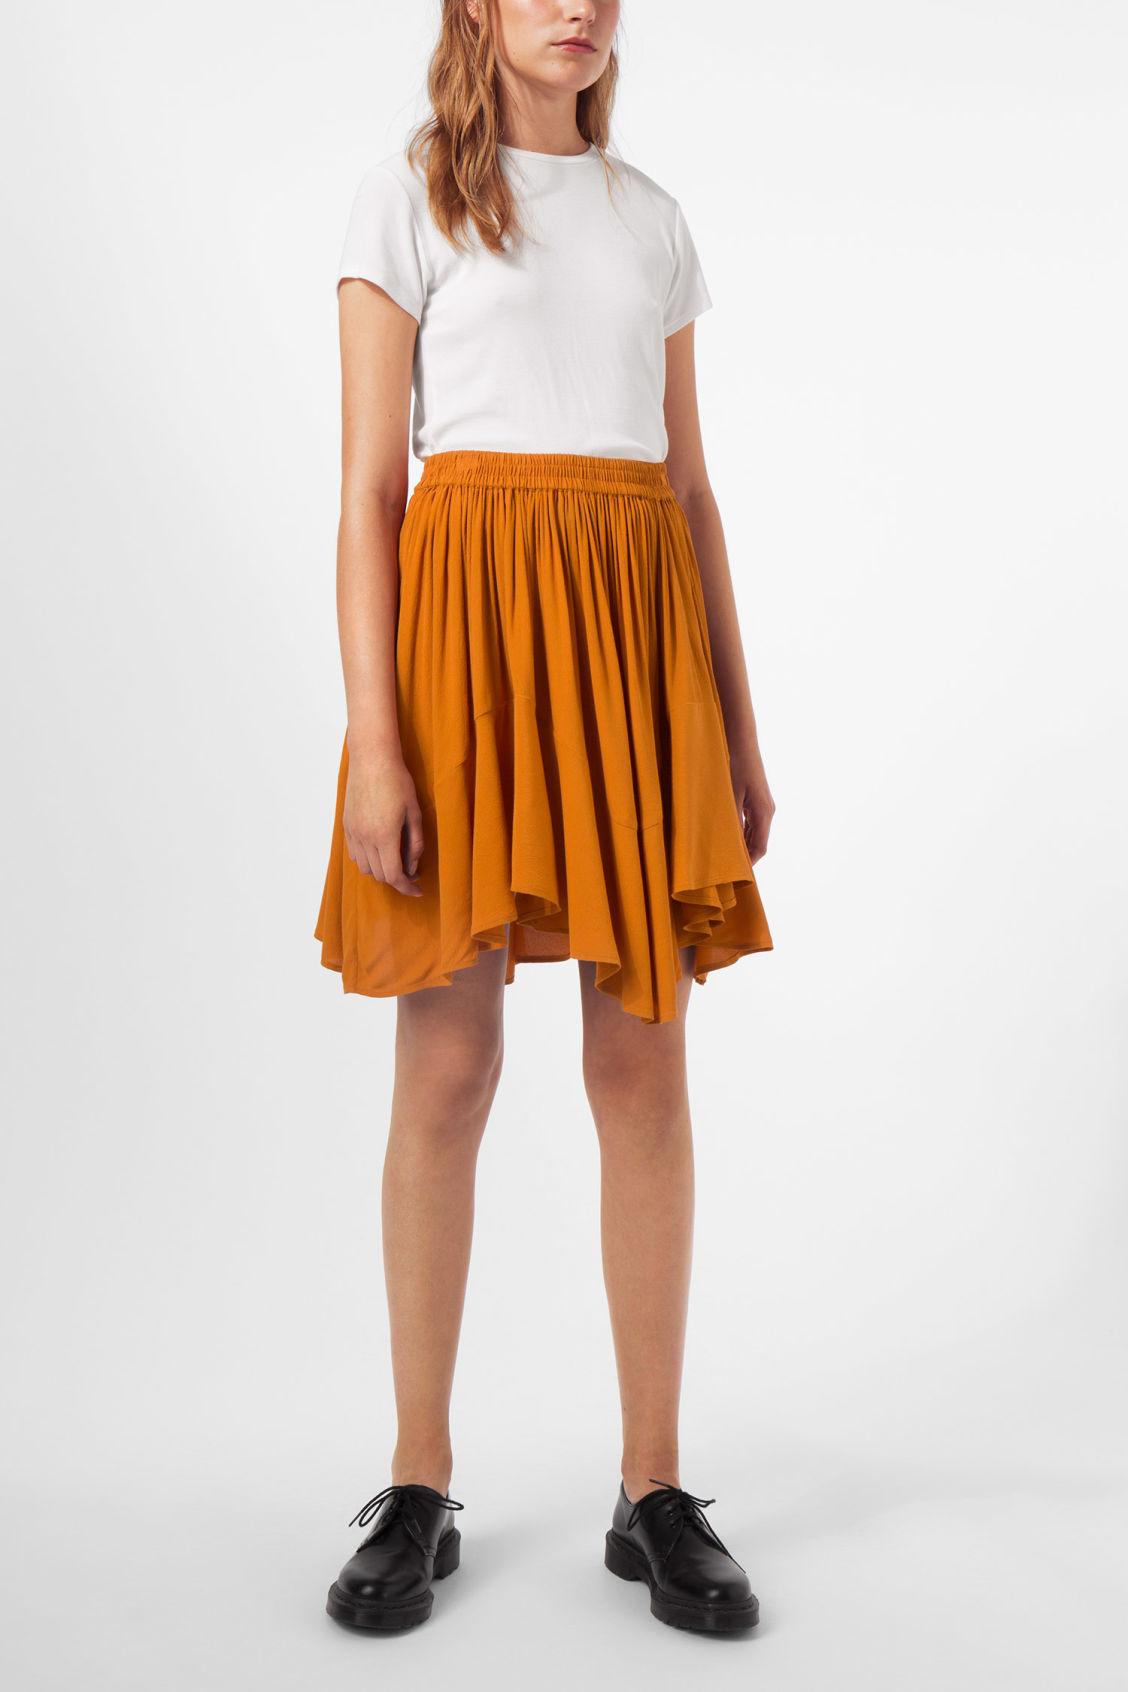 Weekday Minna Skirt - Yellow Sale Amazing Price 7Xvz0S8UQt